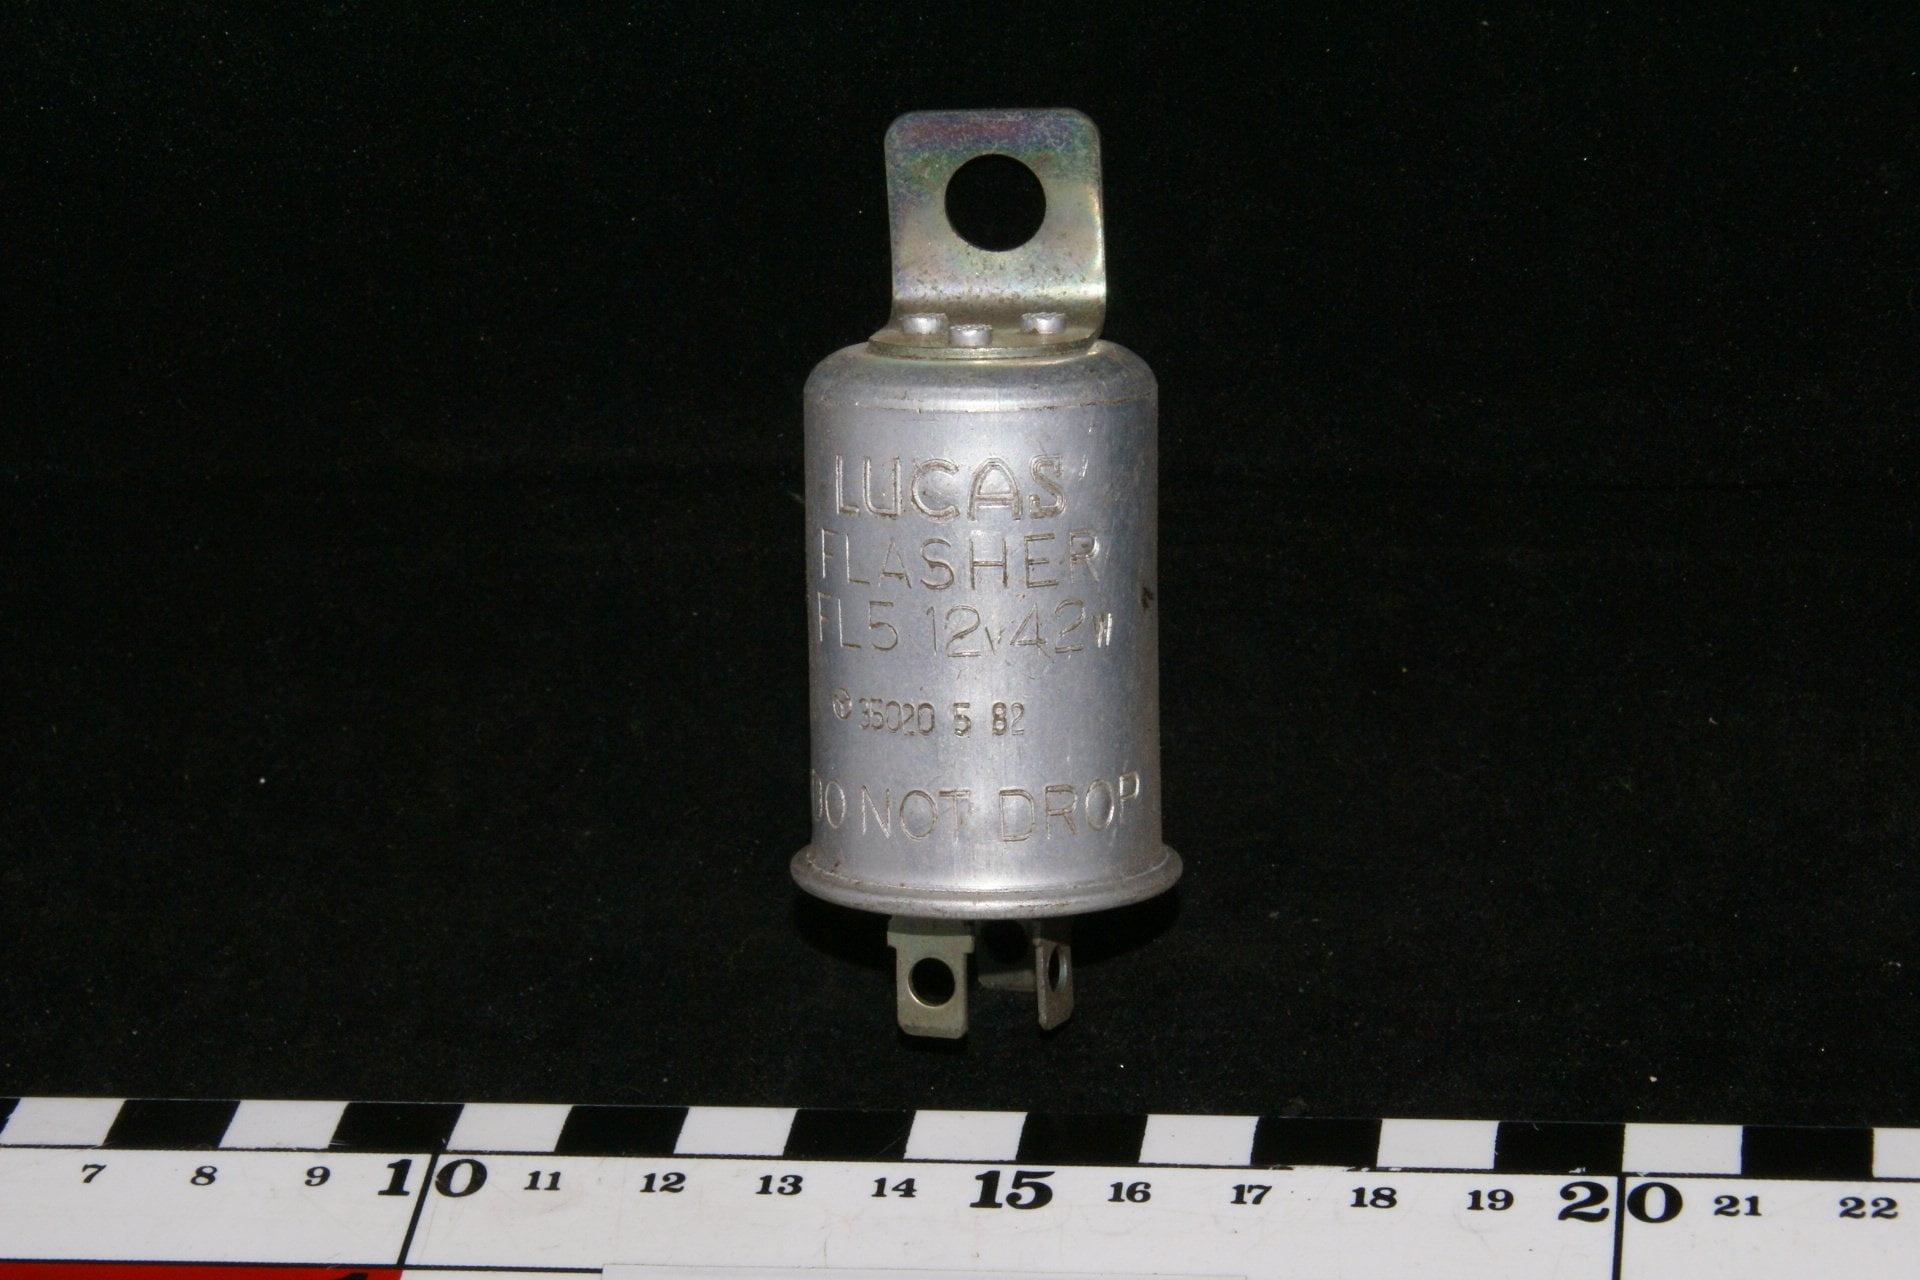 DSC00914 Volvo Lucas Flasher 55620 5 82